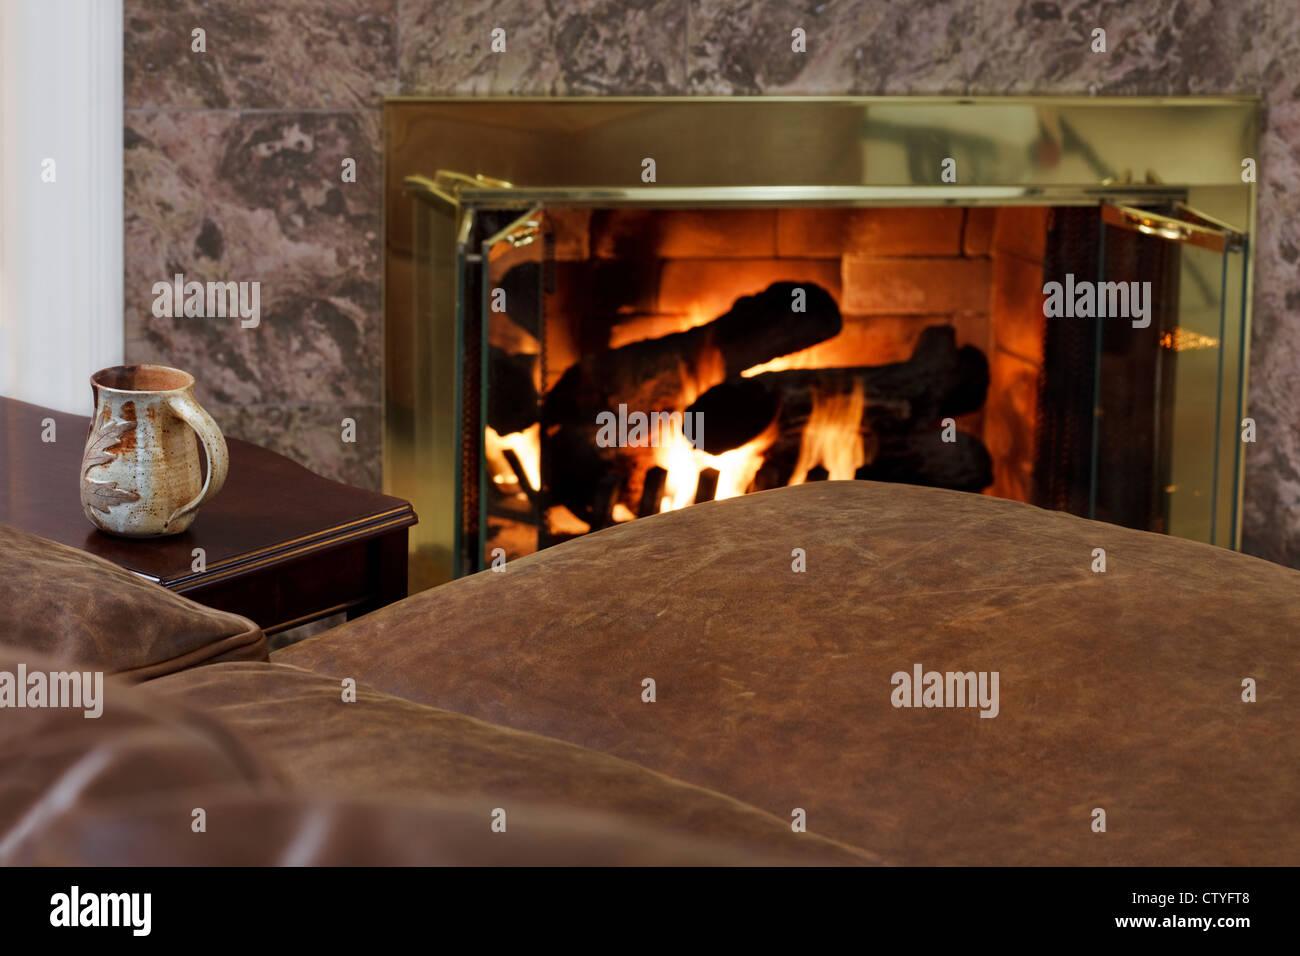 Coffee mug & comfy sofa by the fire - Stock Image